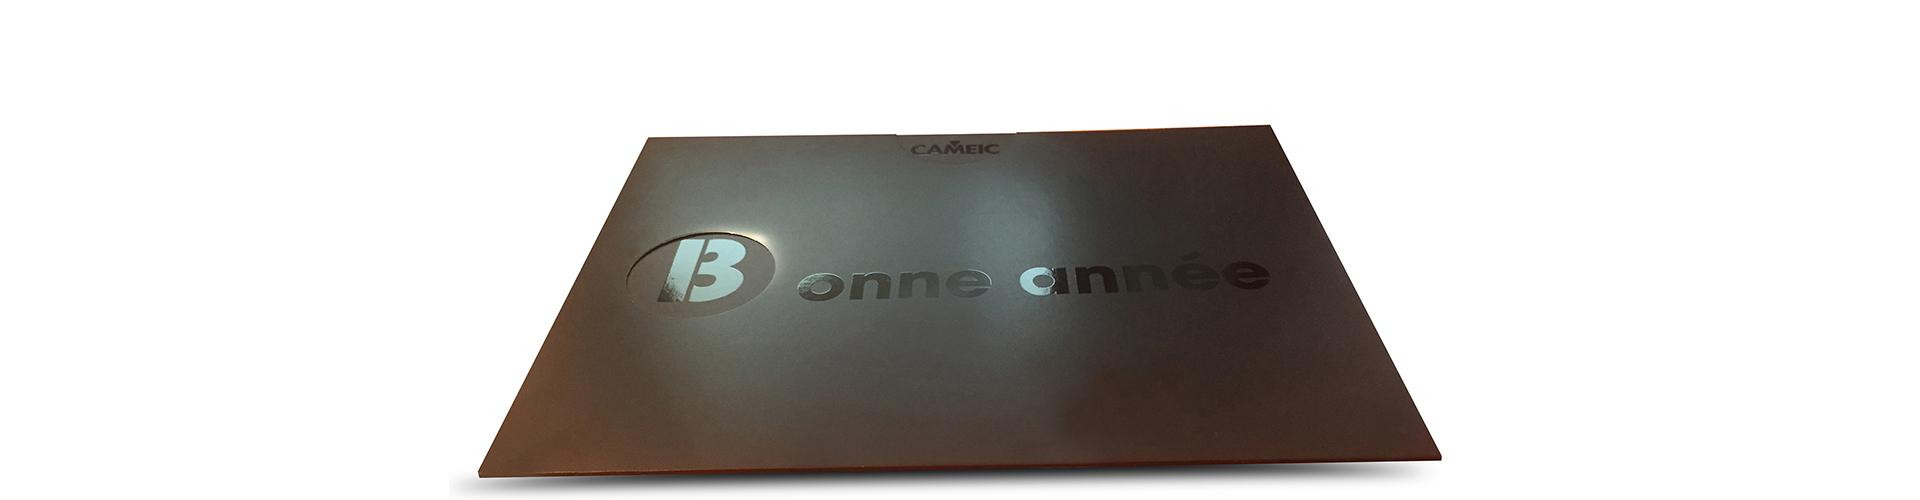 cameic-bg-2